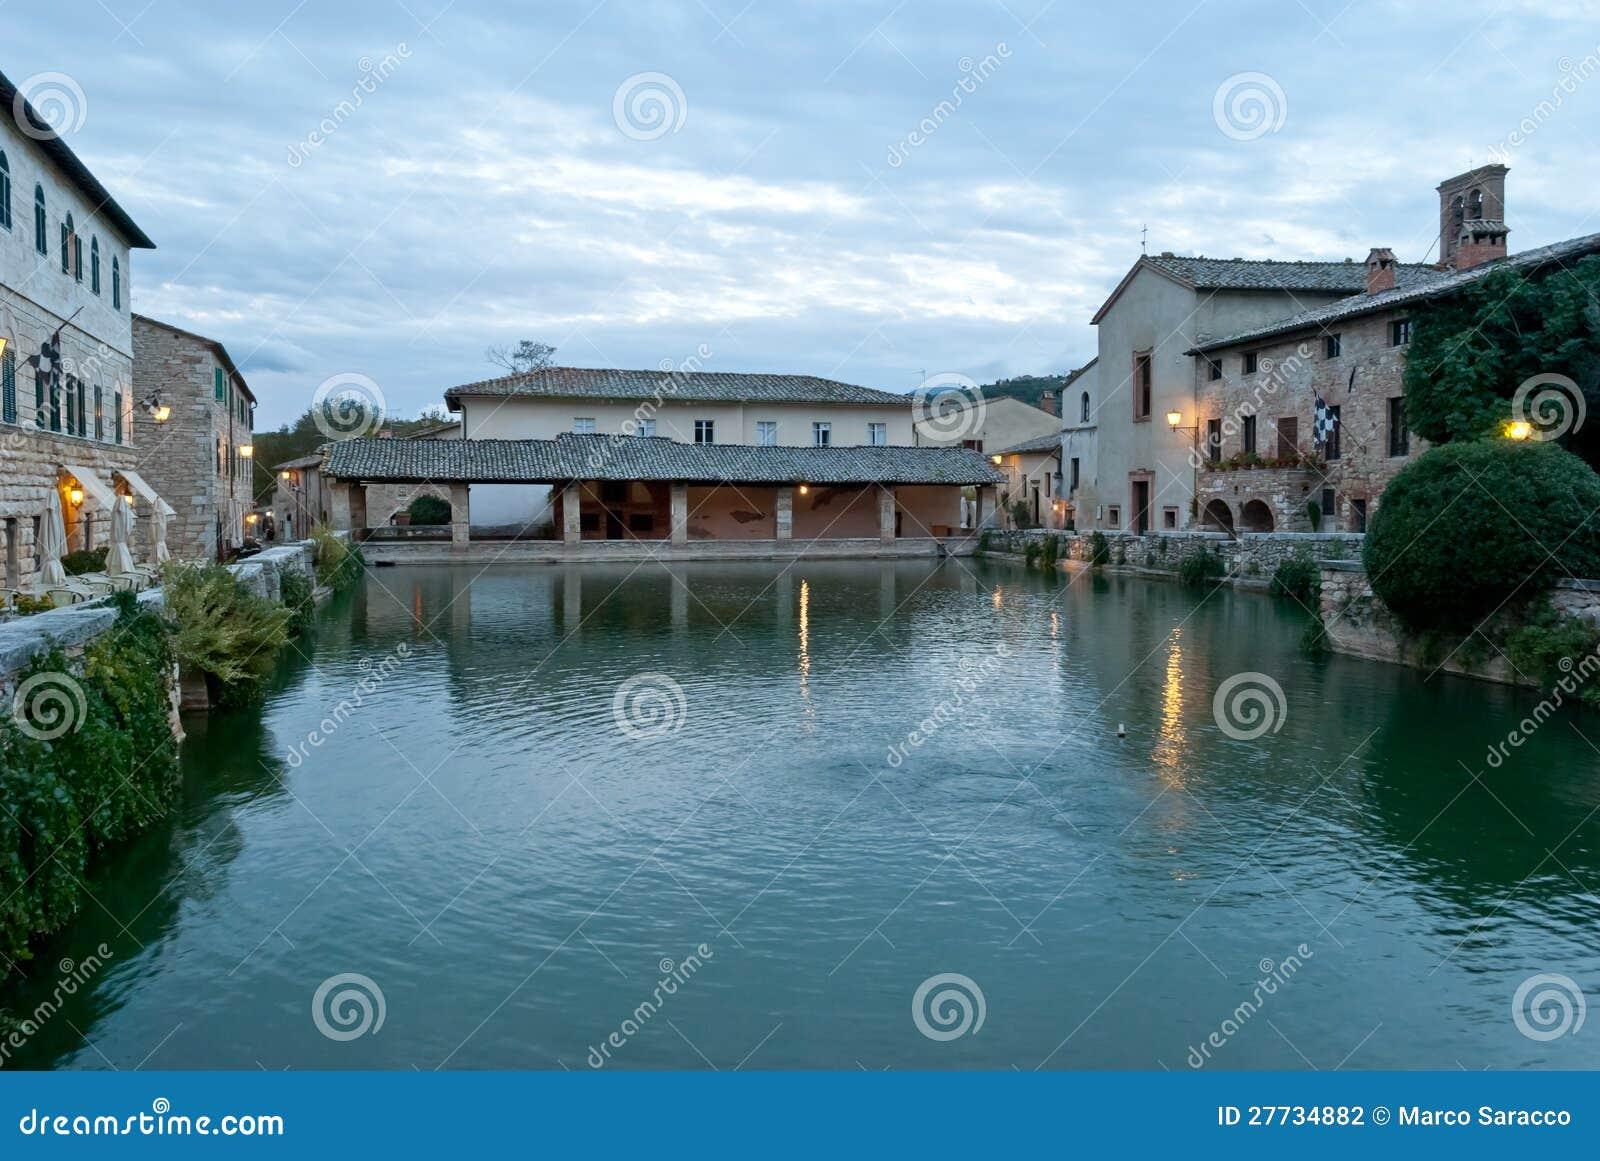 Bagno Vignoni heiße Frühlinge, thermisches Wasser, Toskana